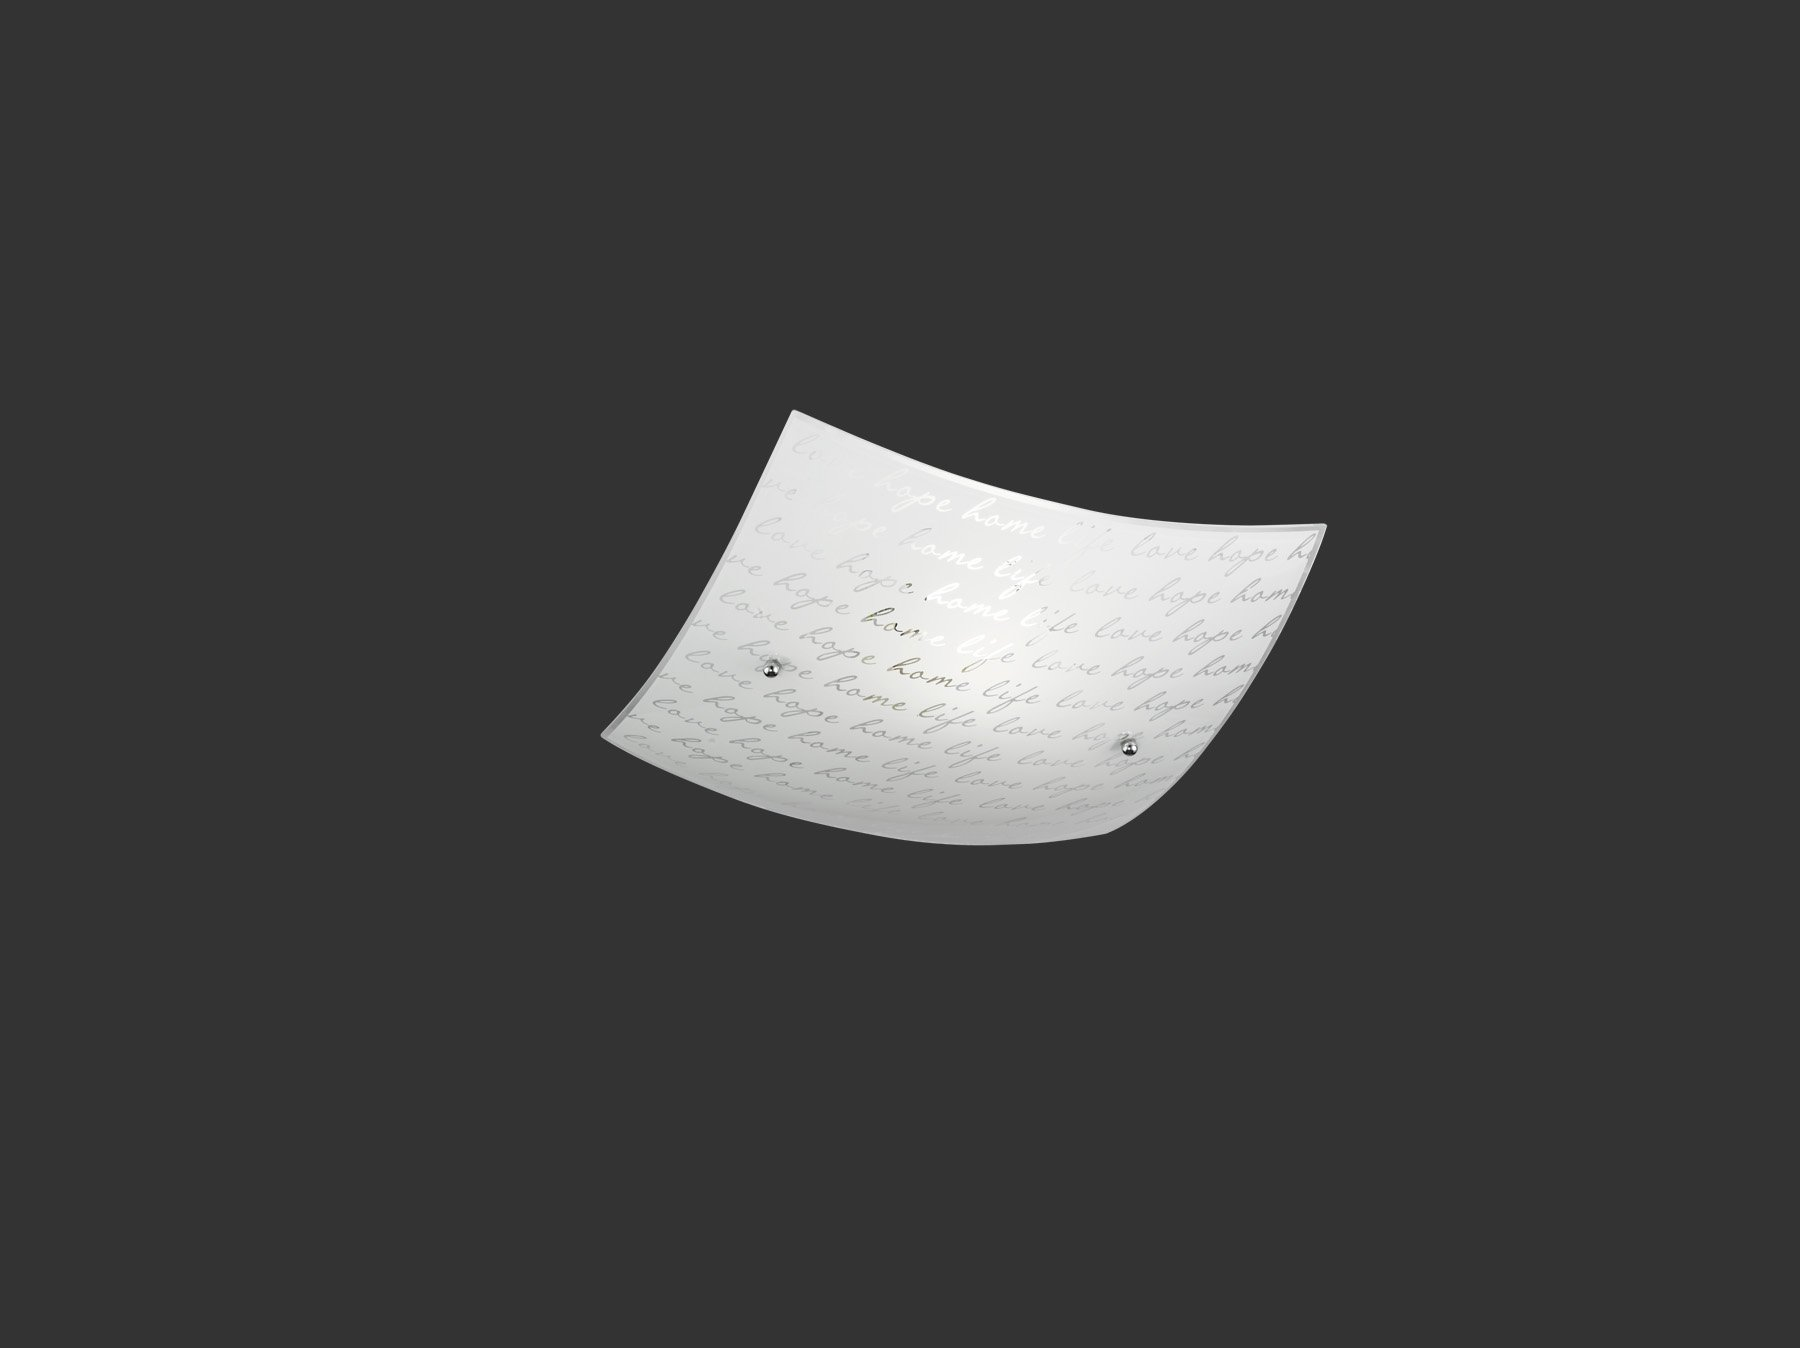 Plafoniera Quadrata Vetro : Signa plafoniera quadrata vetro decoro firma d. 30x30cm nr.1